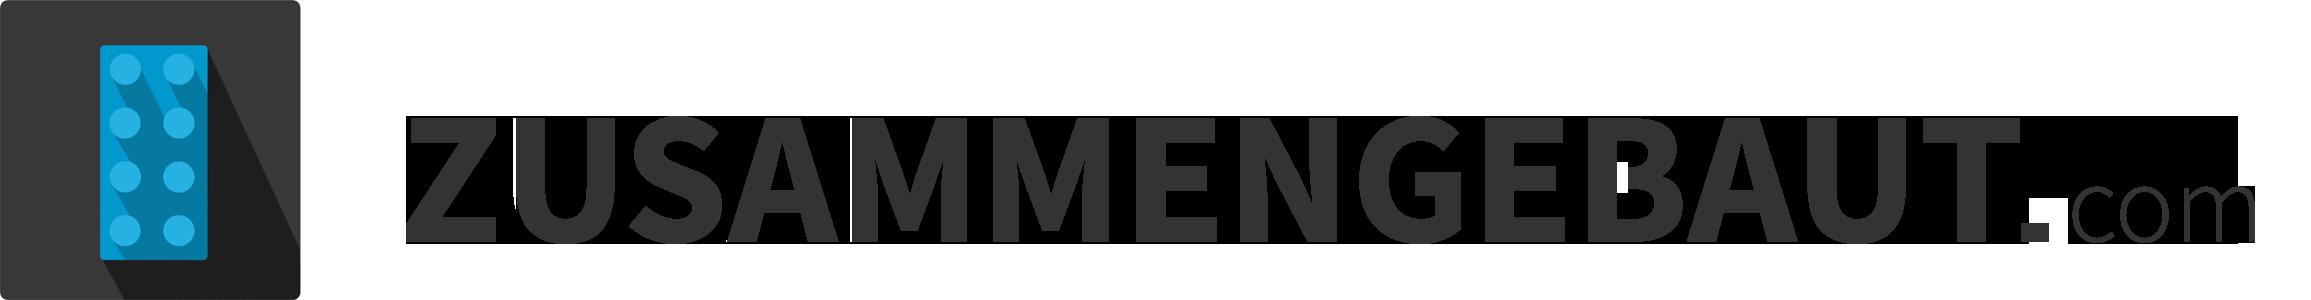 Logo Zusammengebaut.com